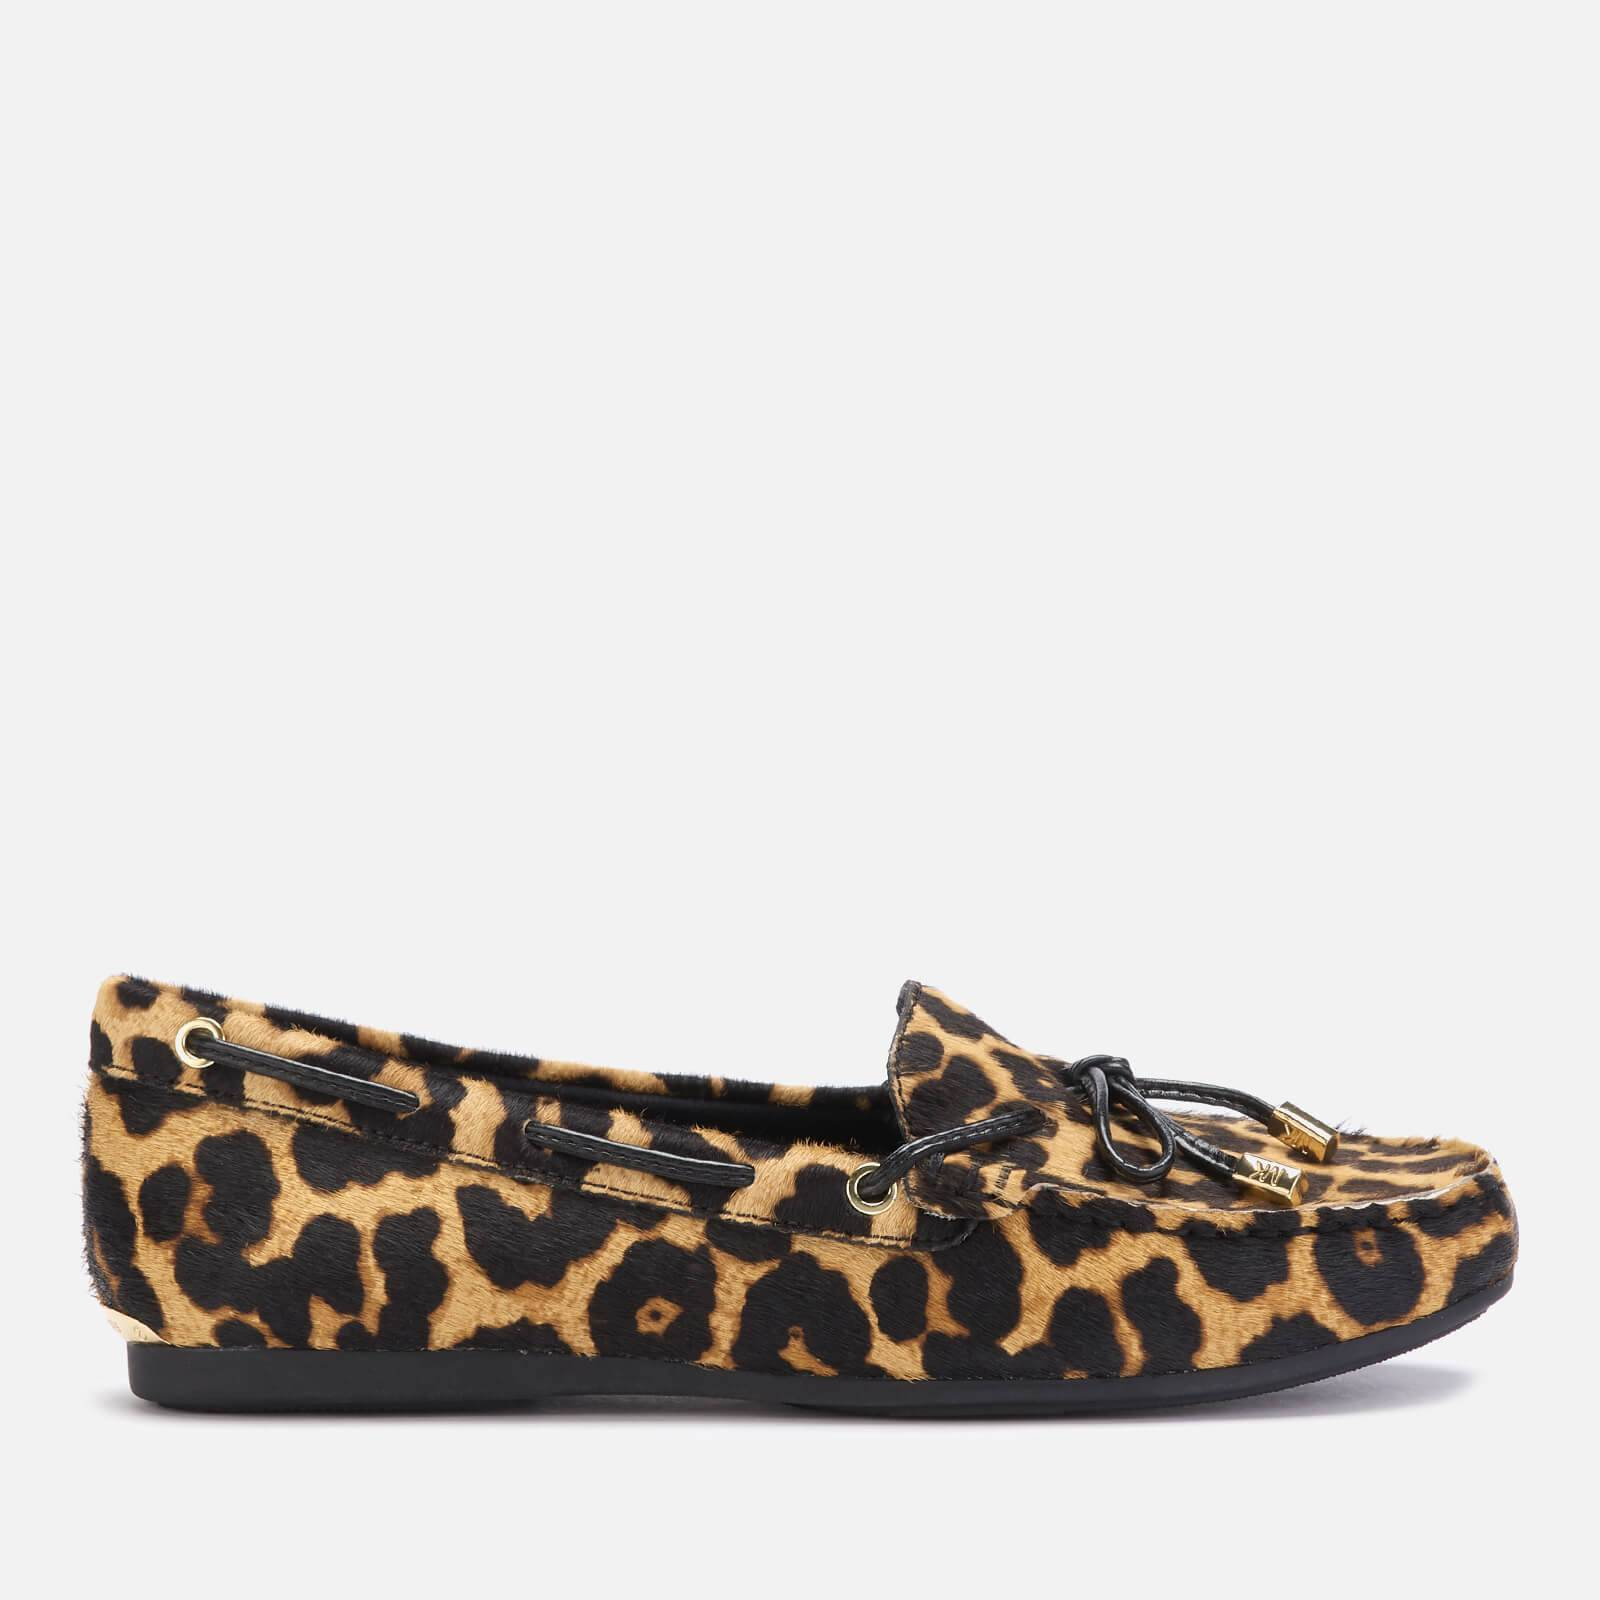 MICHAEL MICHAEL KORS Women's Sutton Leopard Moc Flats - Natural - UK 3/US 6 - Tan